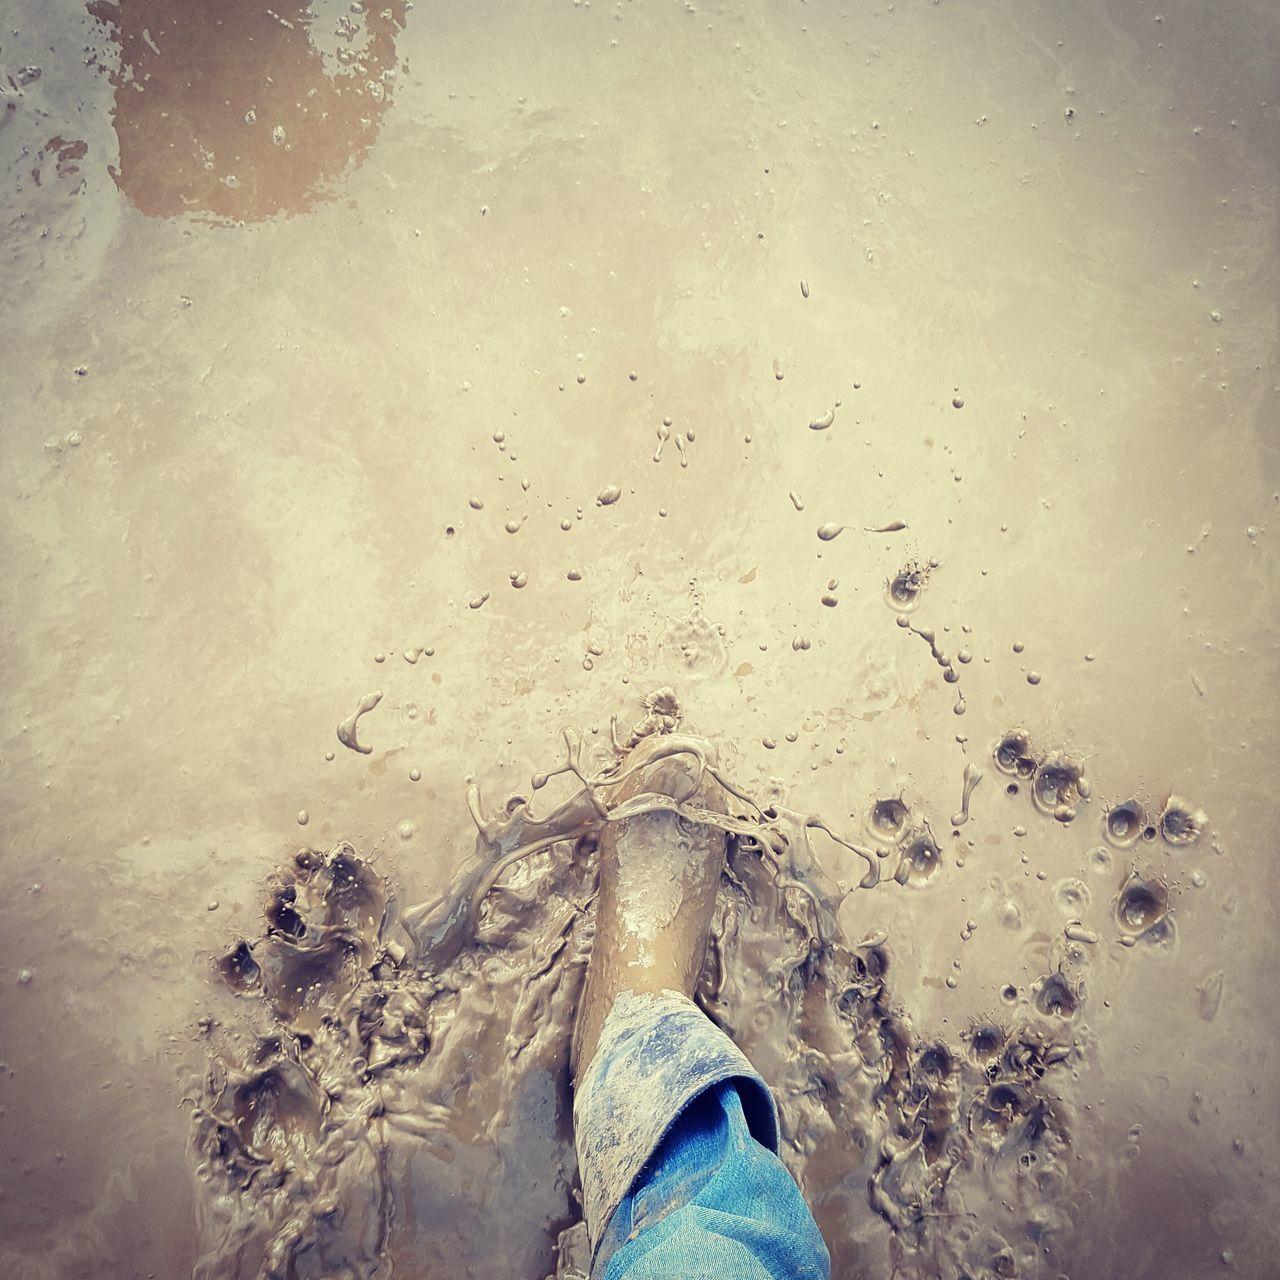 Wellies  Wellington Boots Mud Splash Festival Water Wet